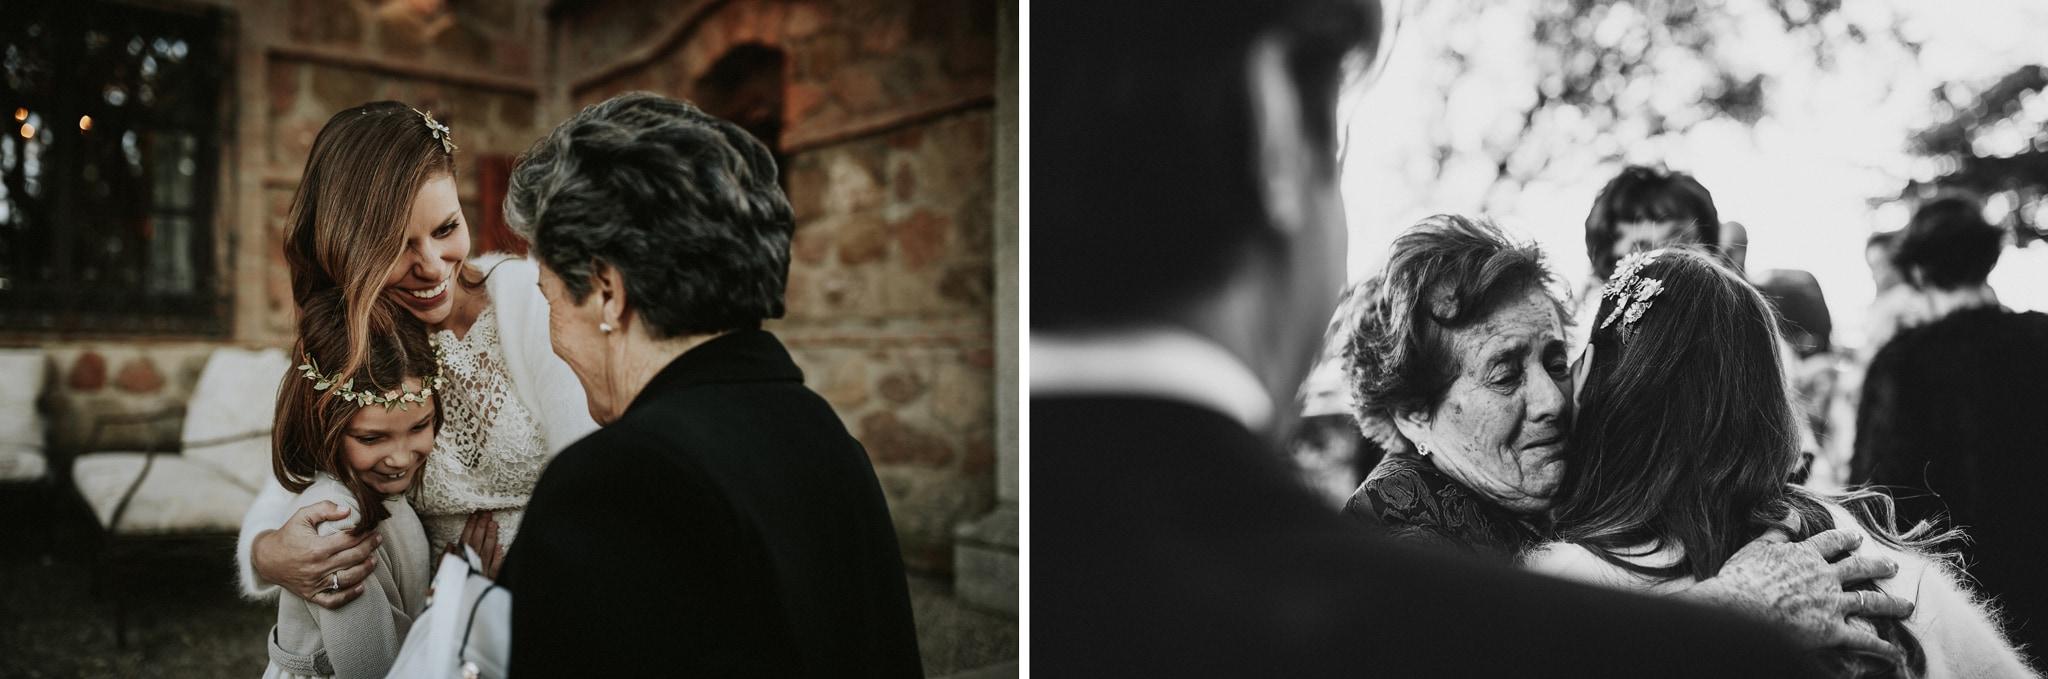 Fotografo-bodas-Cigarral-de-las-Mercedes-89